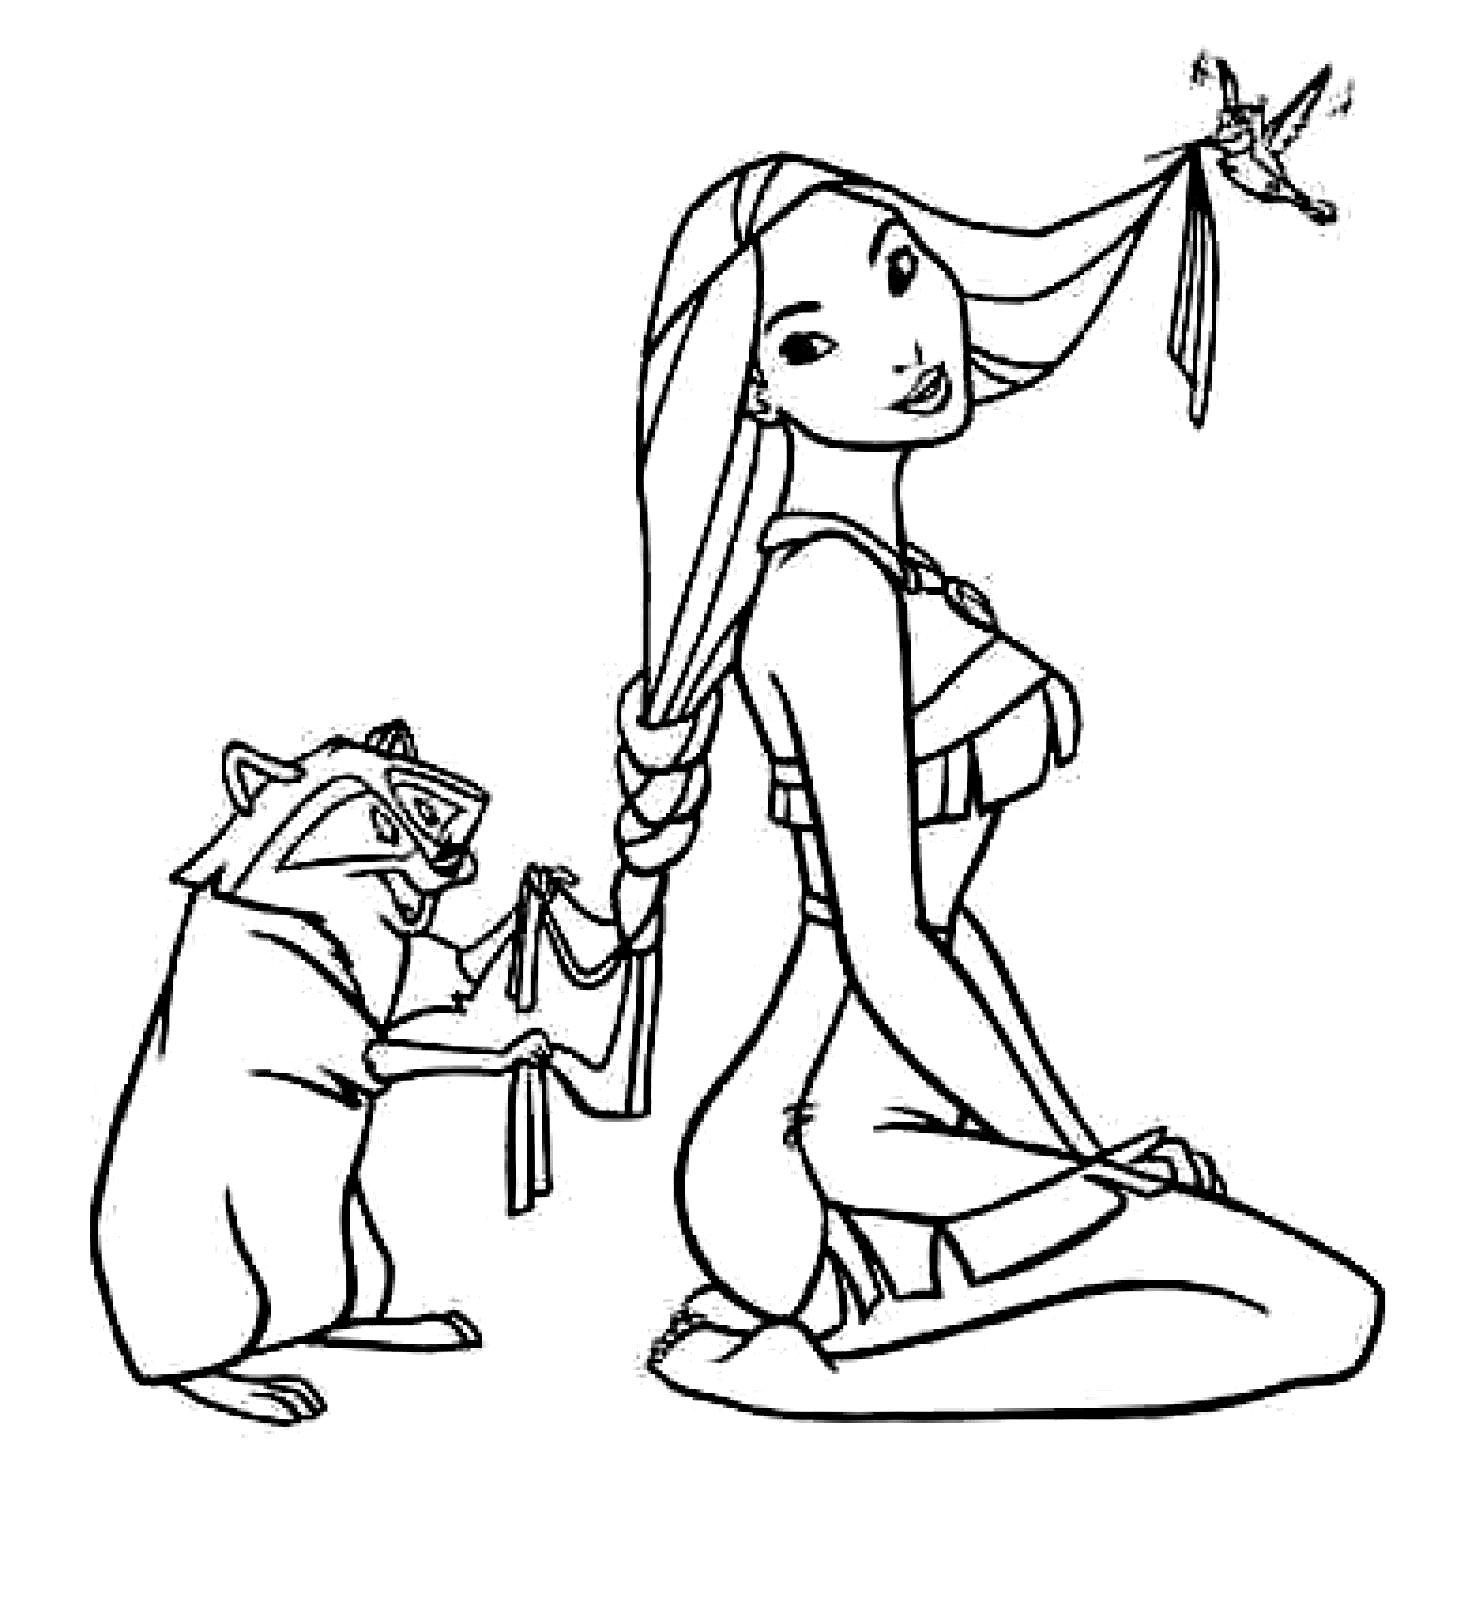 Disney princess coloring pages pocahontas - Cloring Pages Printable Pocahontas Coloring Pages Coloring Me